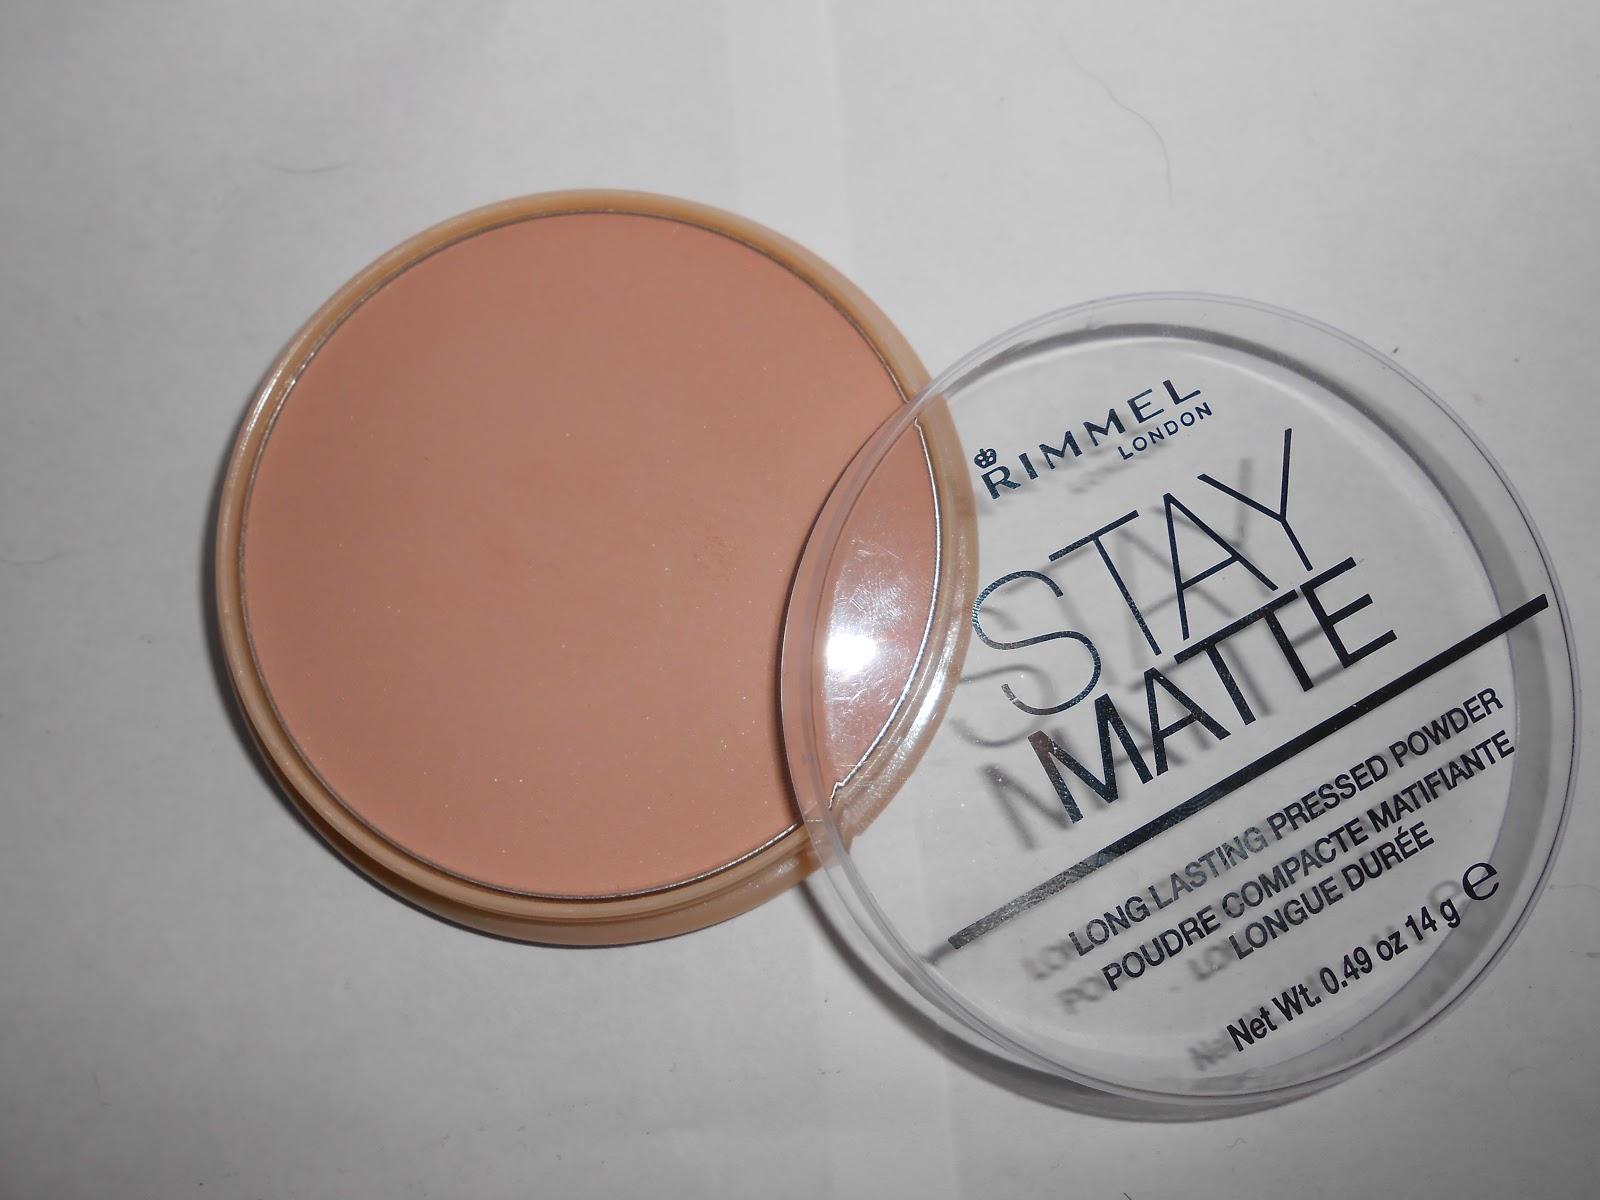 Rimmel Stay Matte Powder Review Nik The Makeup Junkie London Pressed